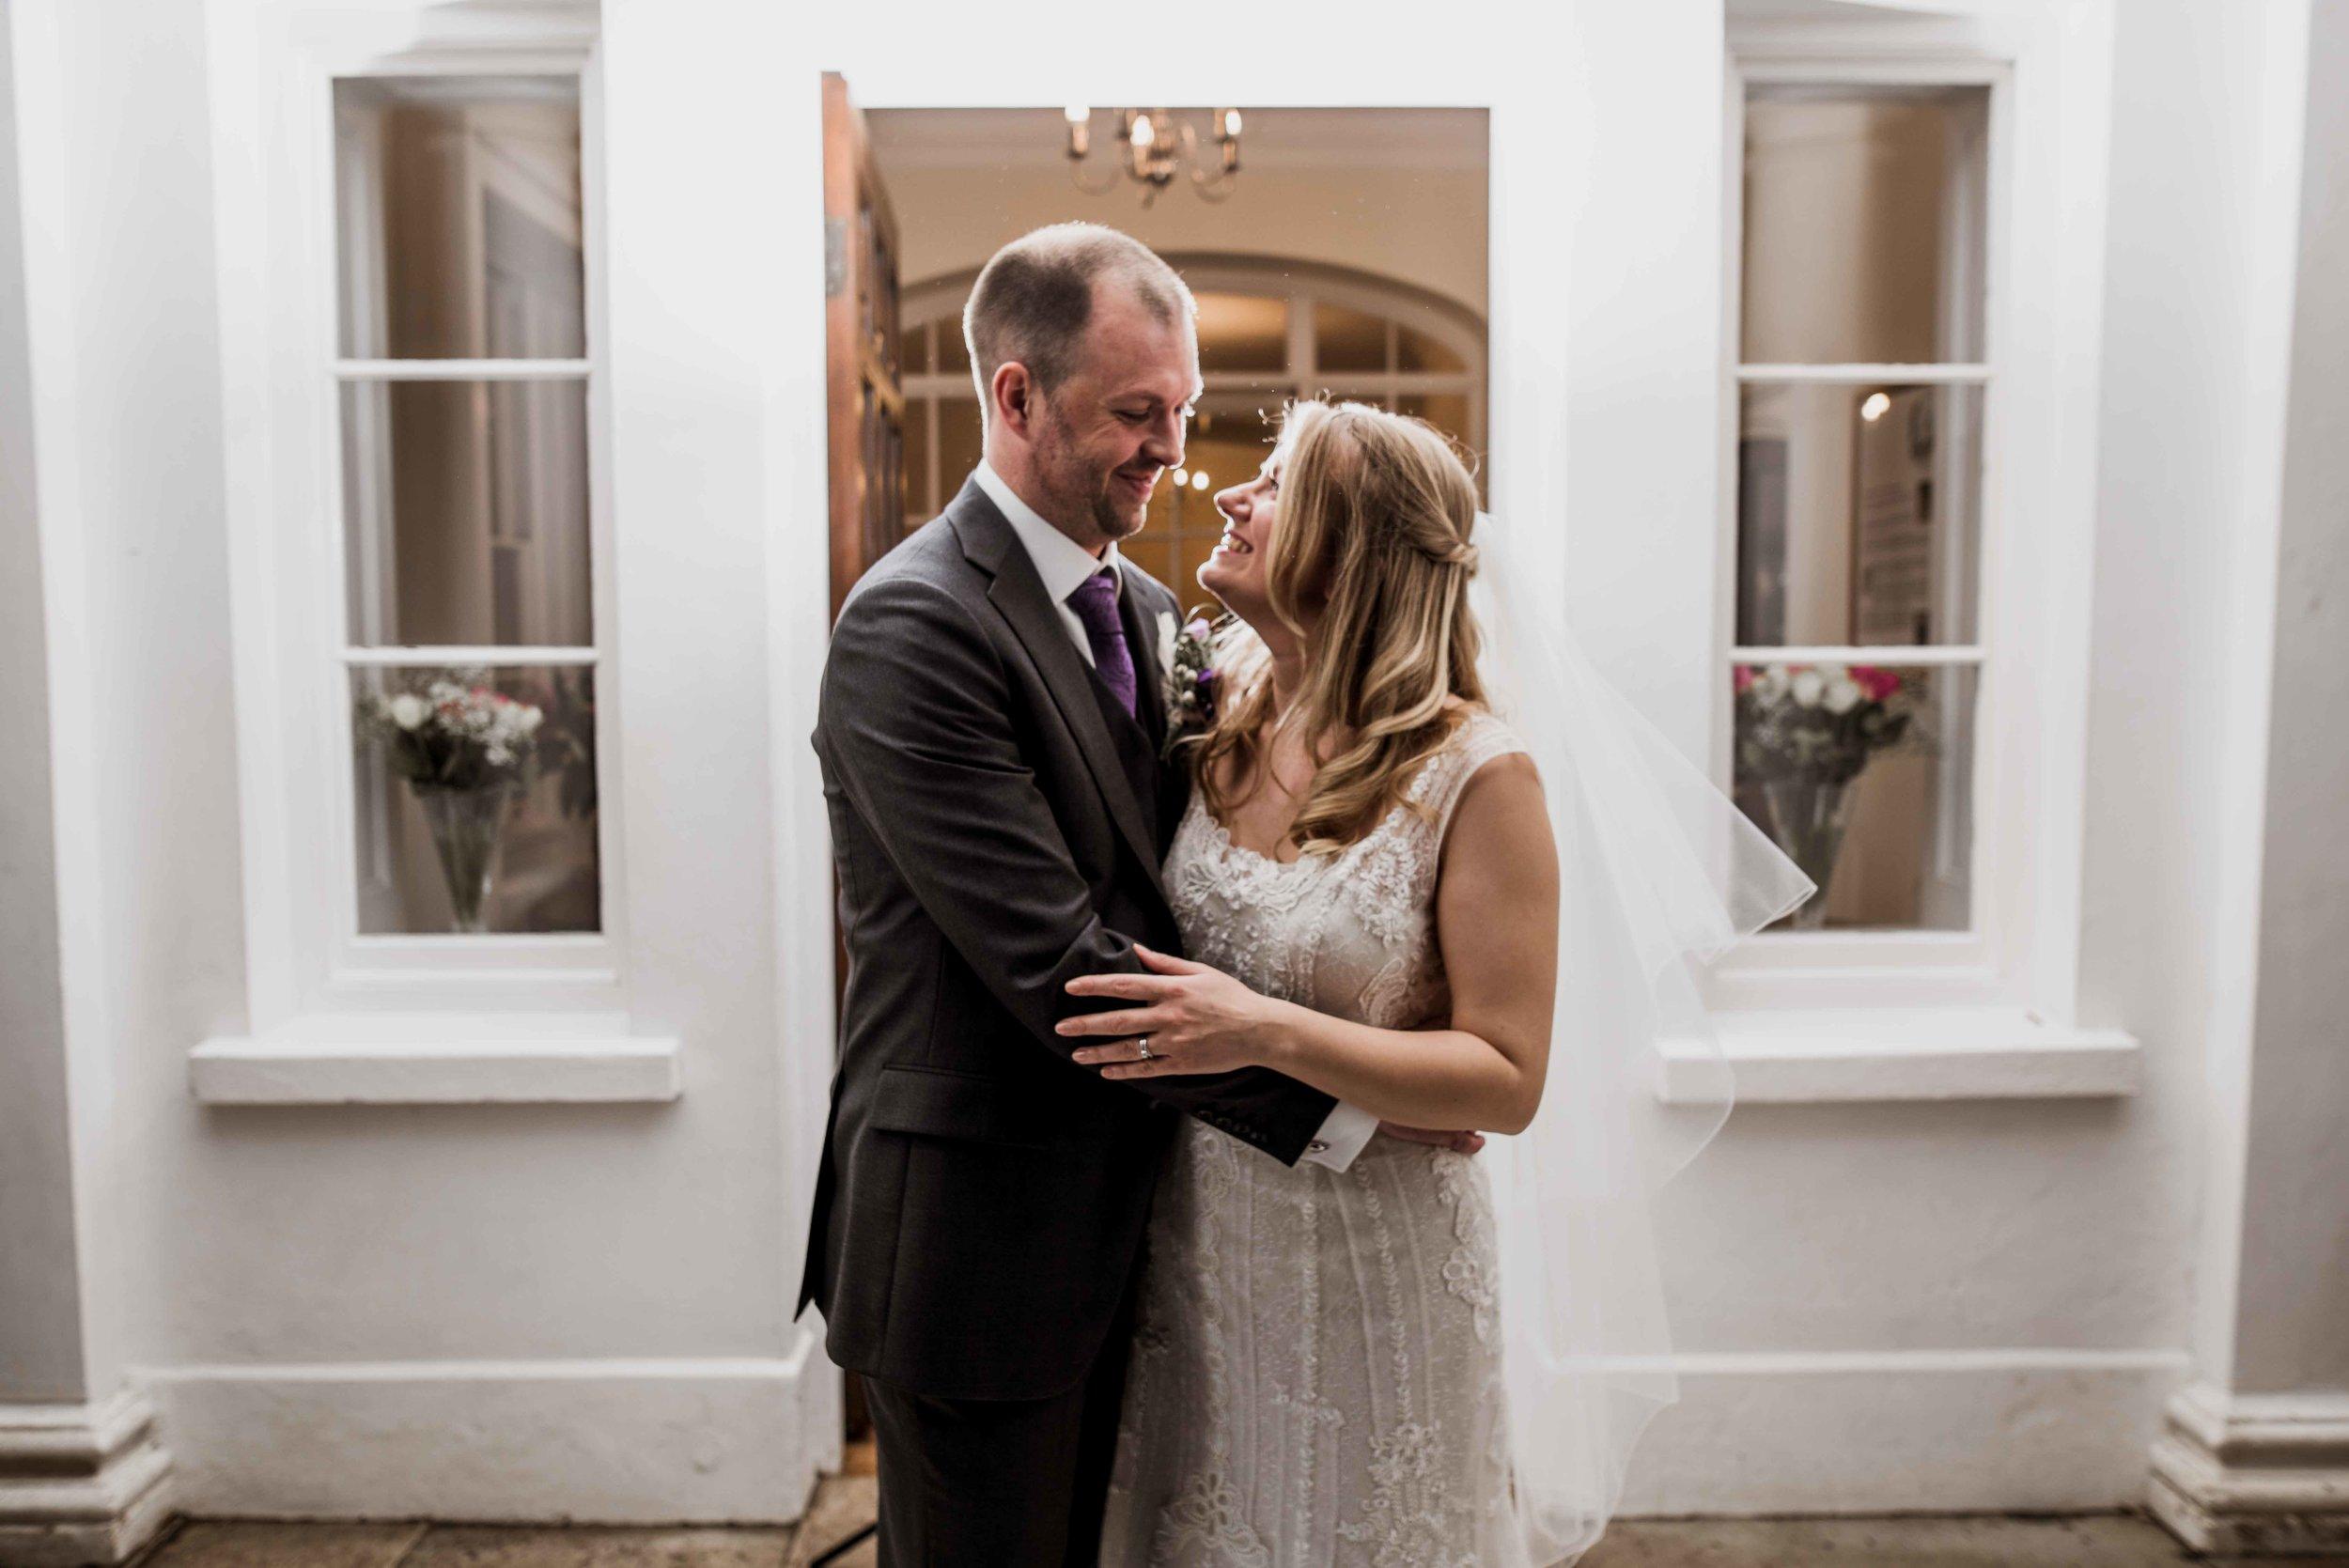 Richmond Park Winter Wedding - February 2018